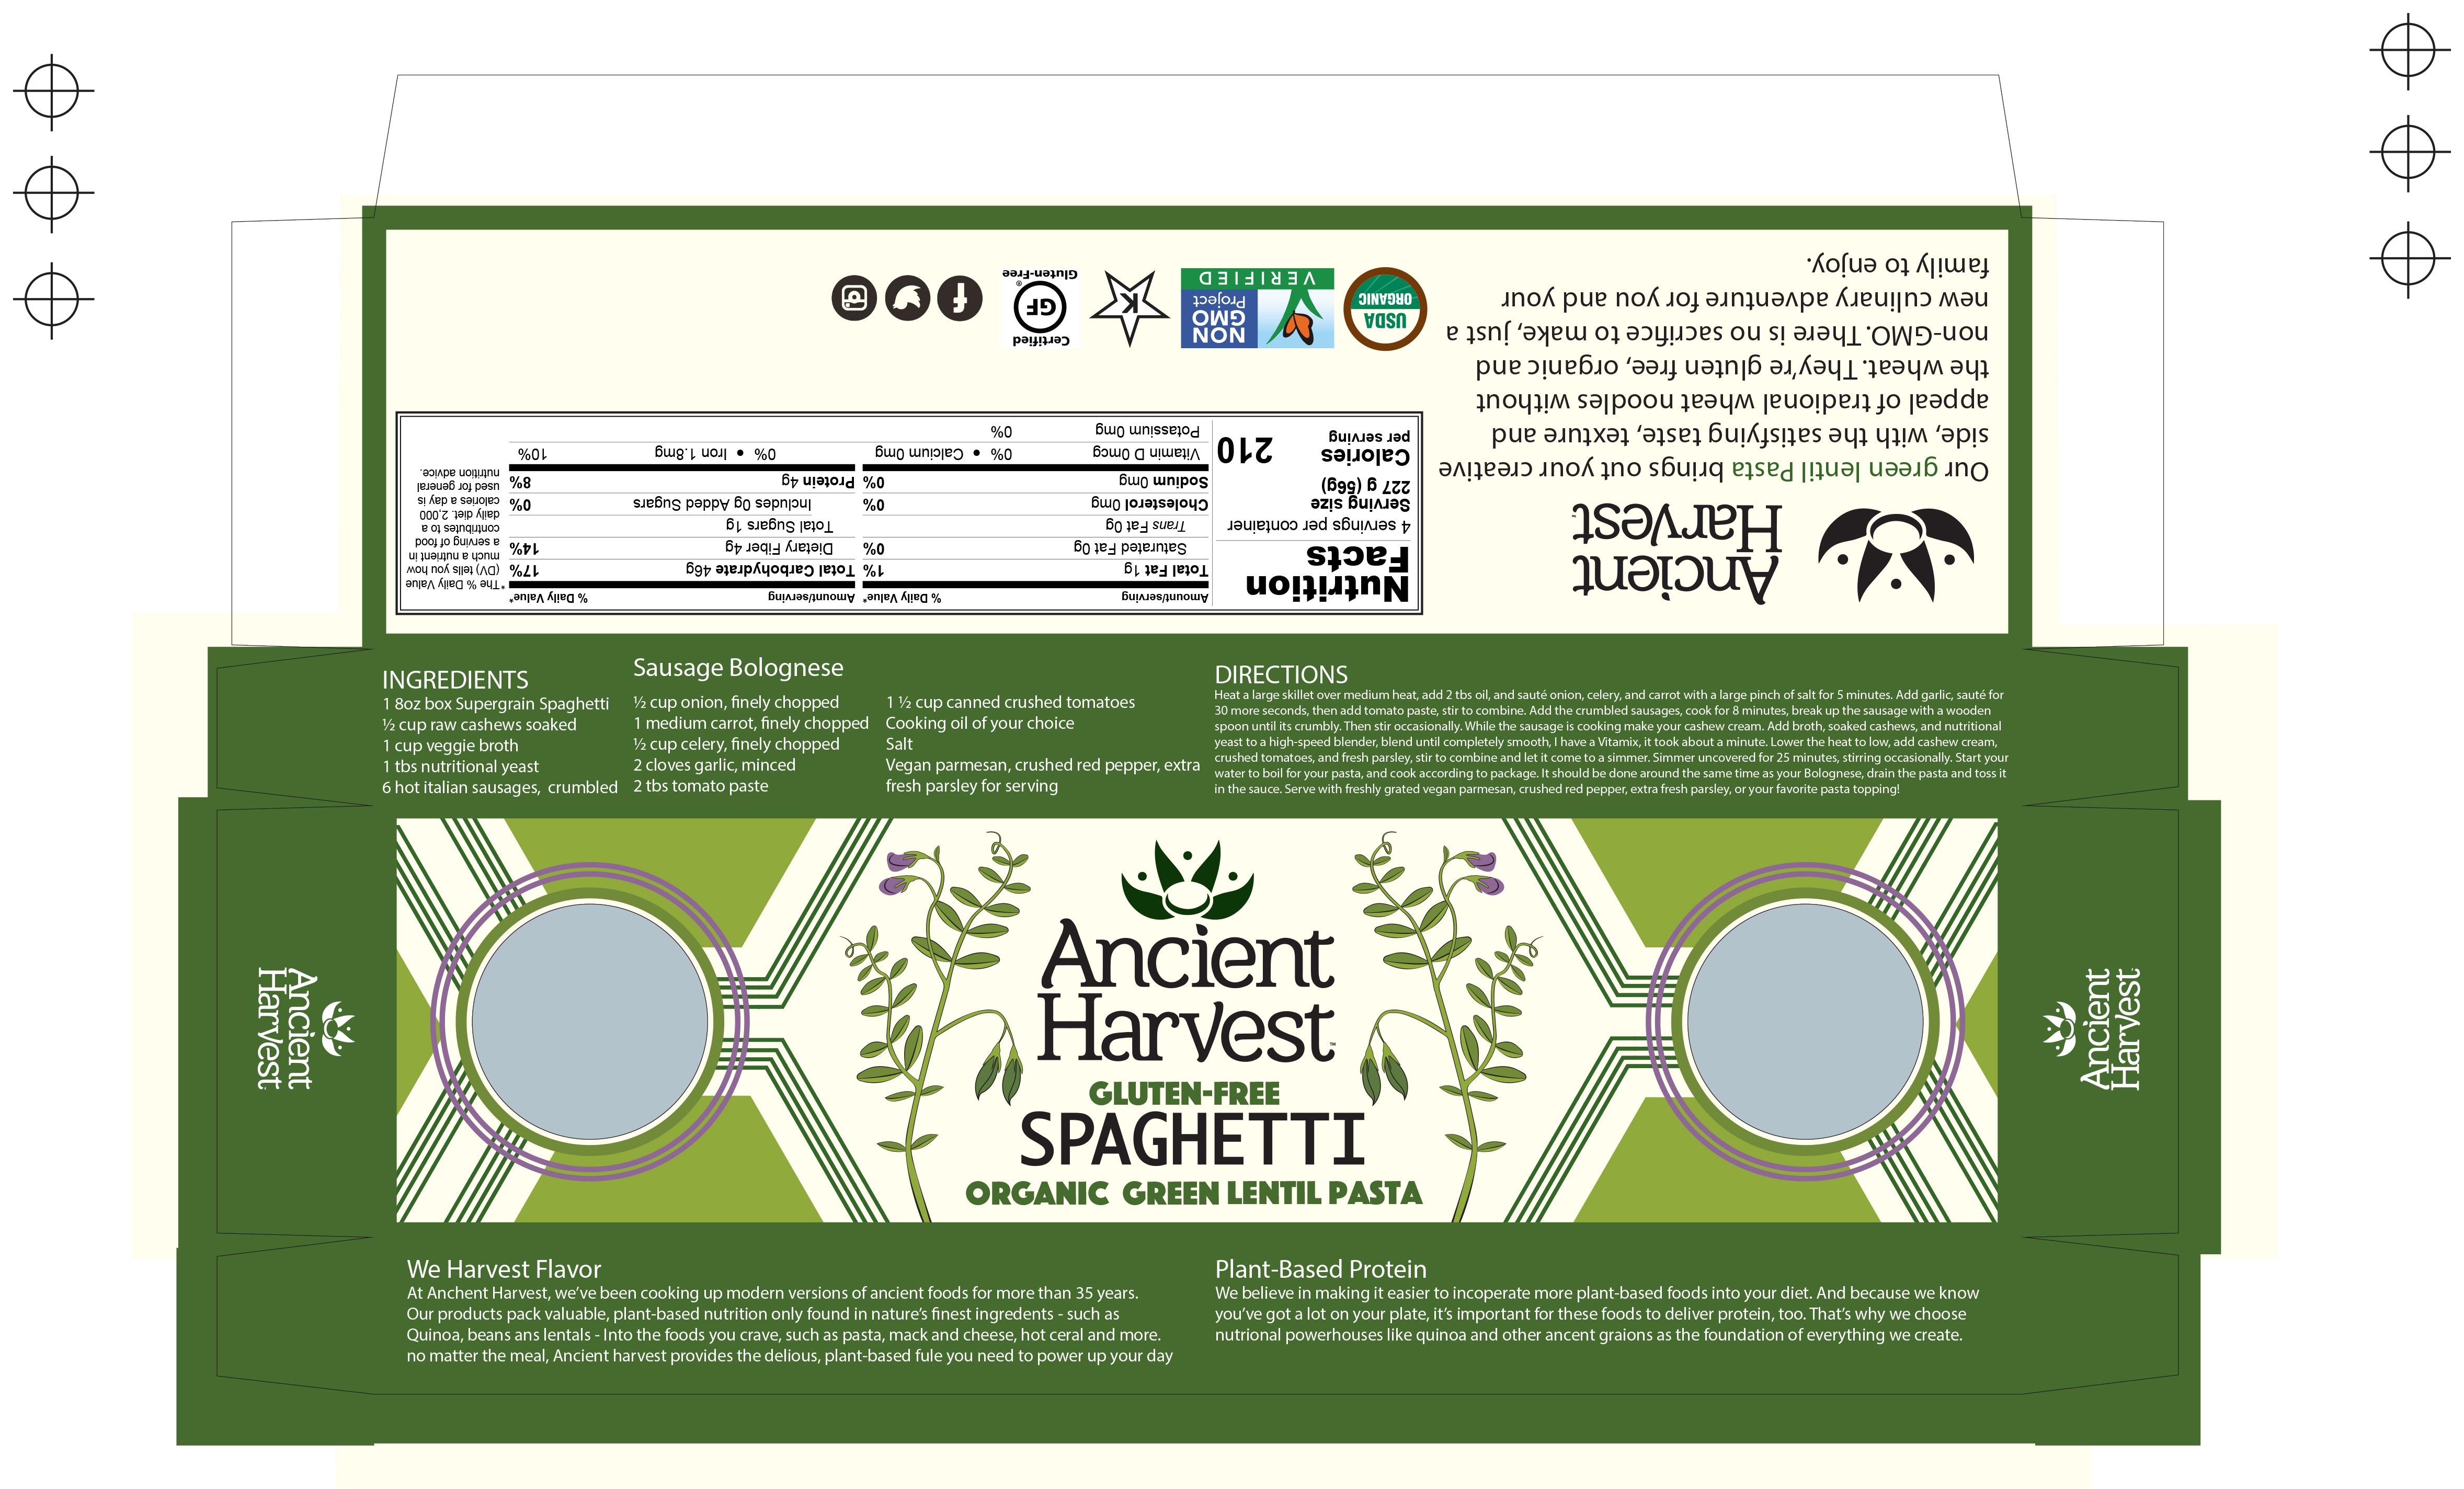 spaghetti 3.1